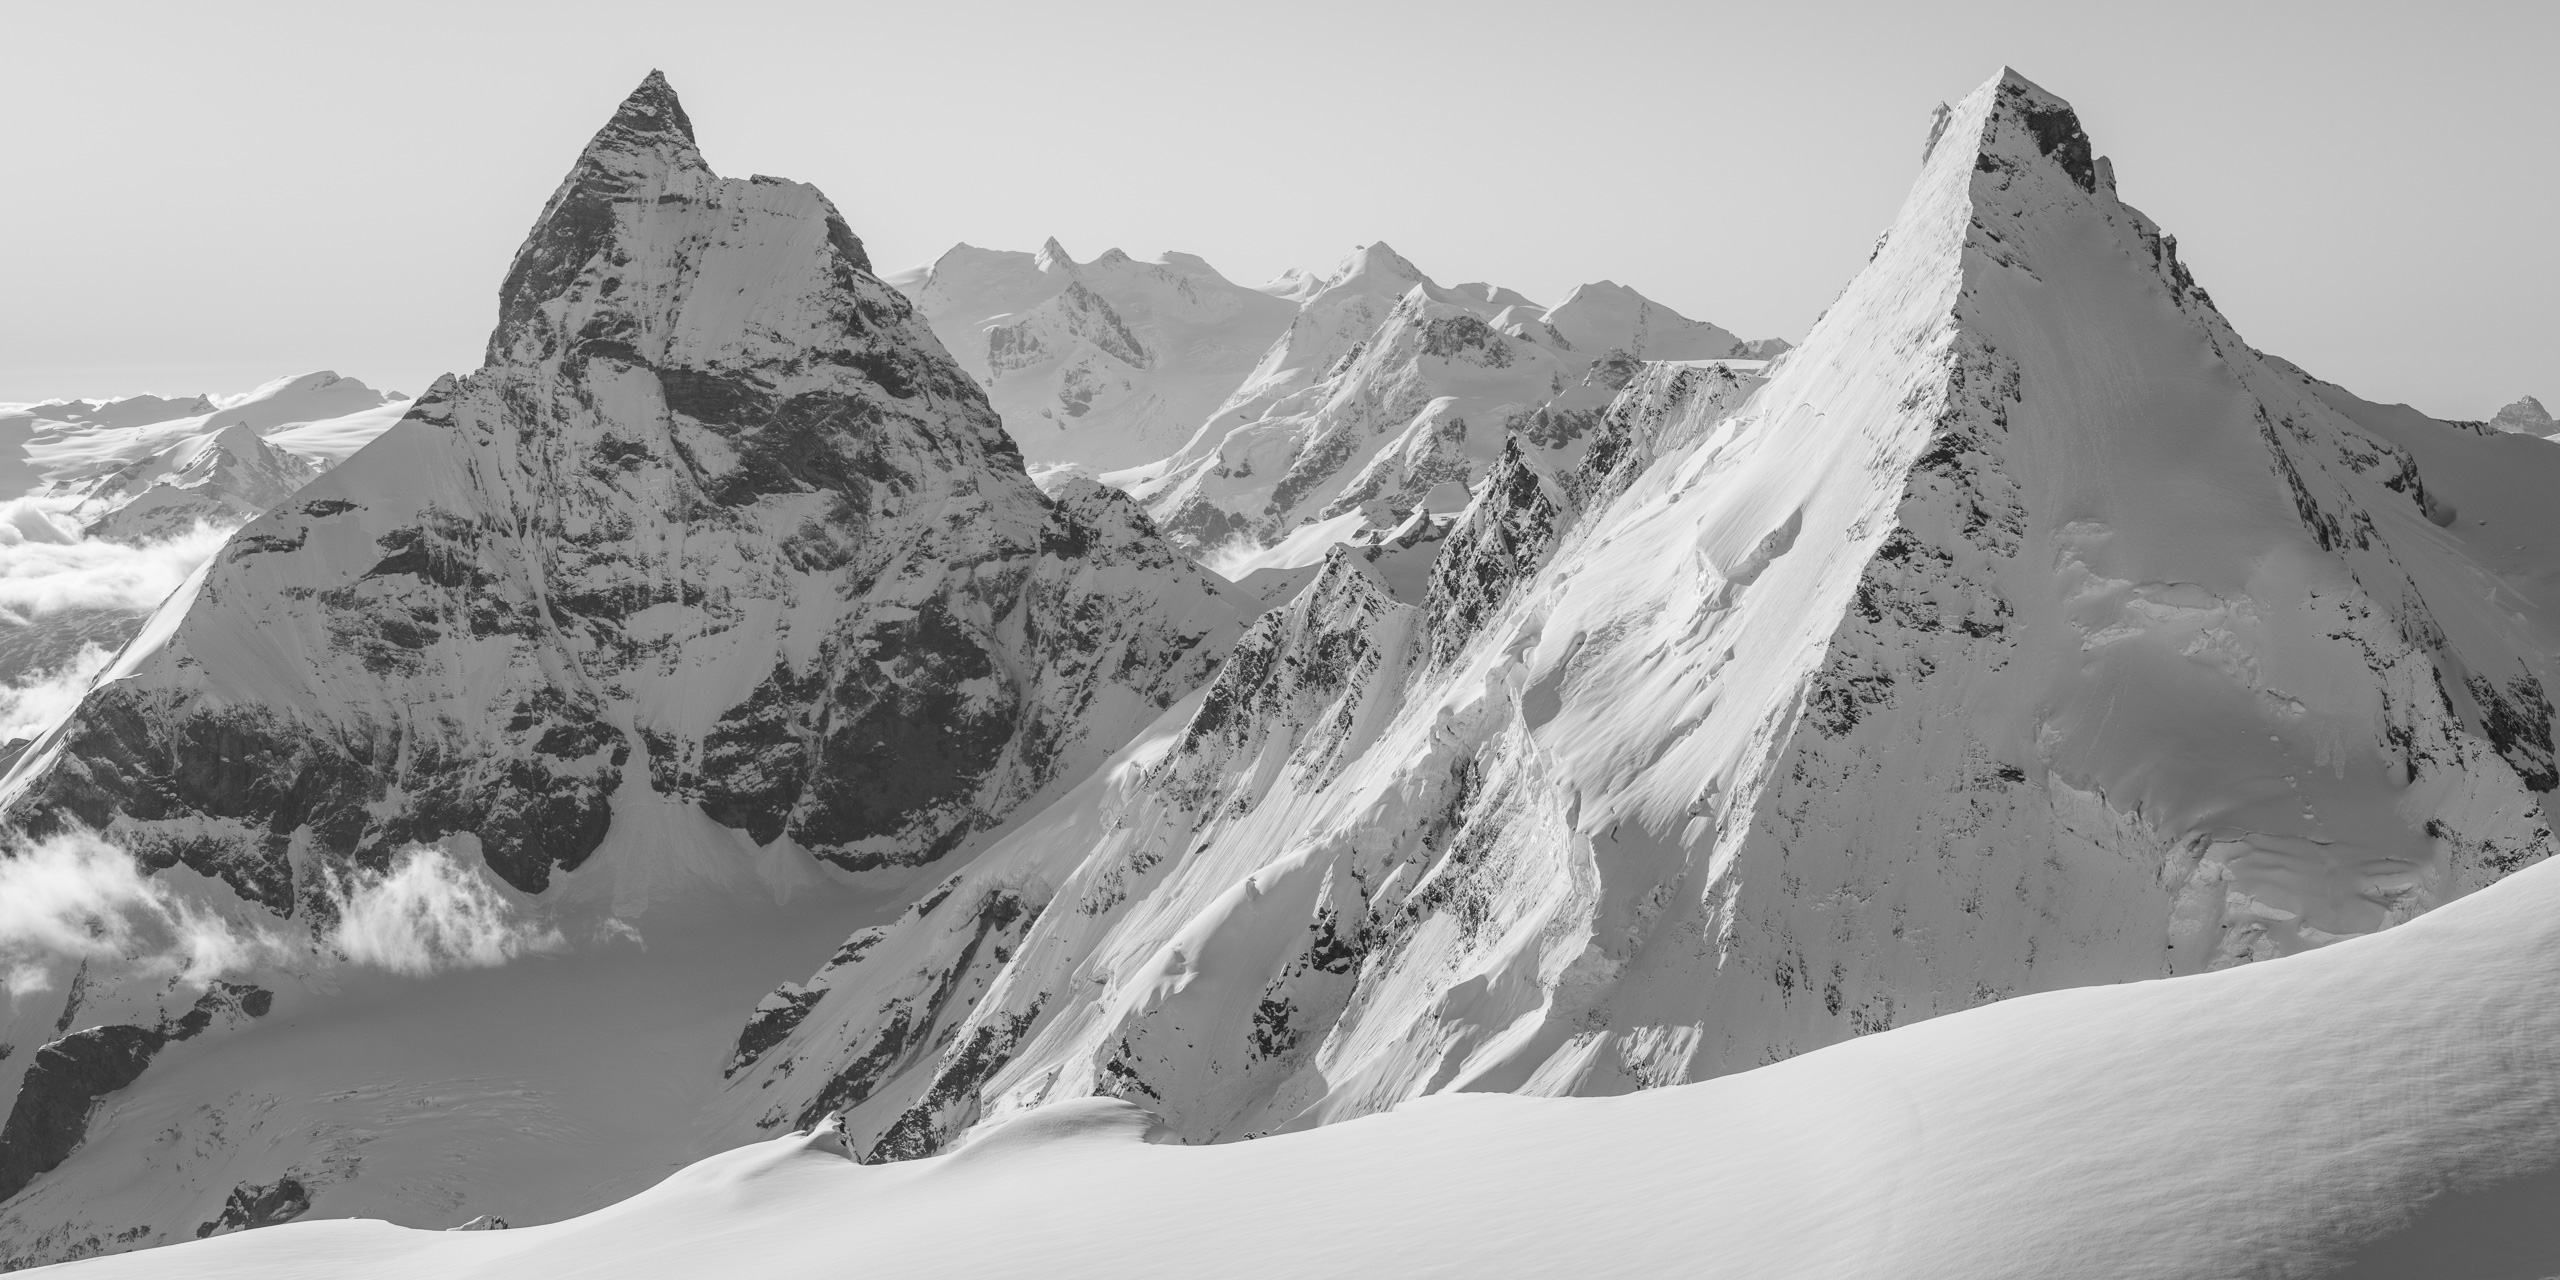 Cervin - Tableau panoramique montagne enneigéed herens